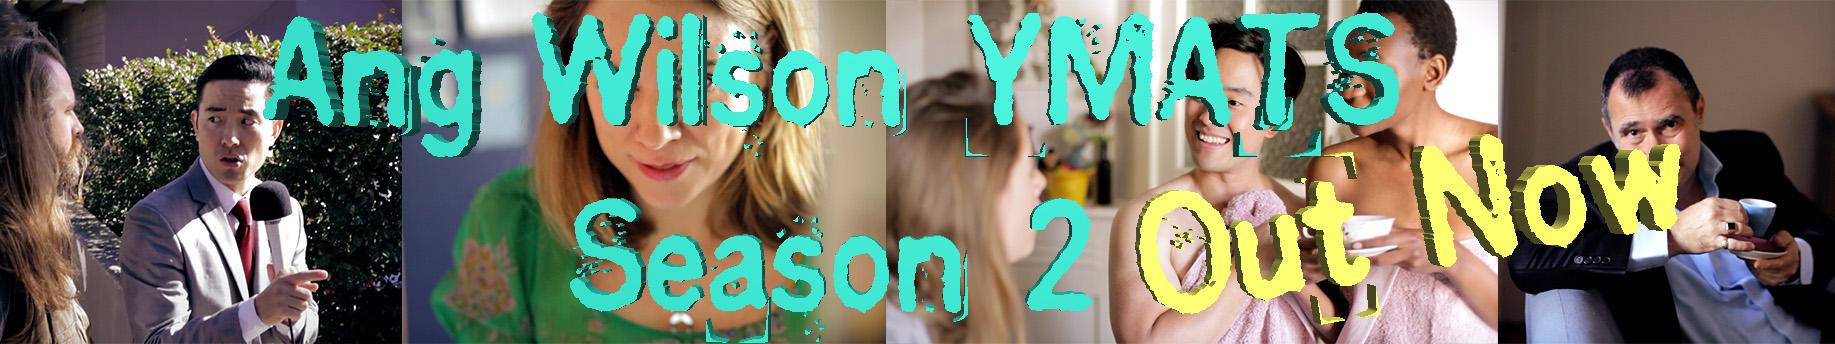 Season 2 Title.jpg